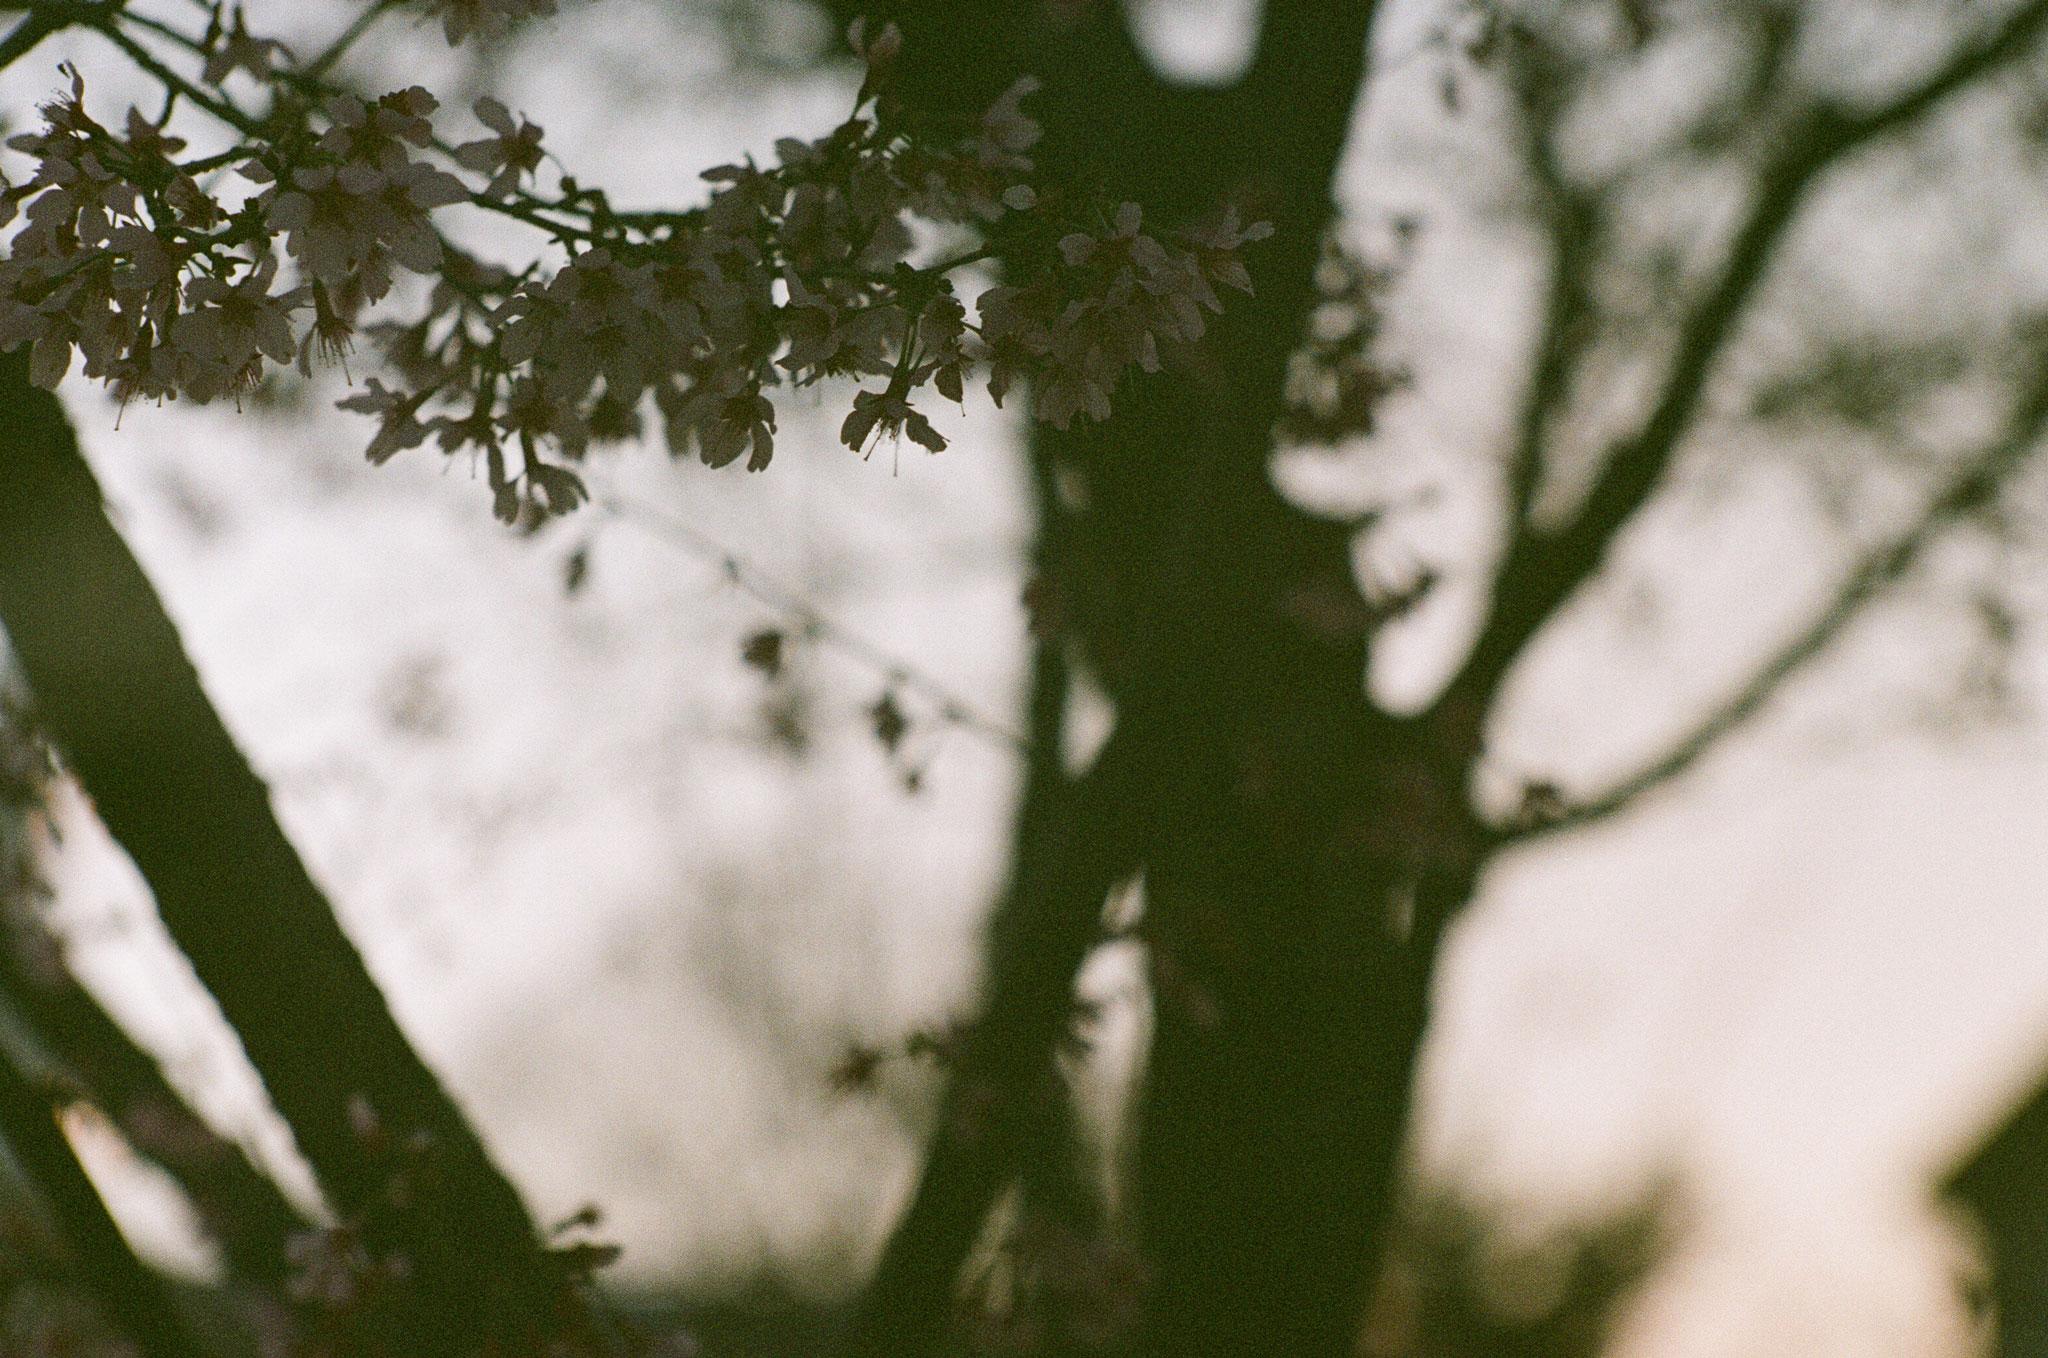 Adrian Gilliam | Japanese Apricot 5 | Zorki 4K | Jupiter 9, 85mm f2 | Kodak Pro 400MC